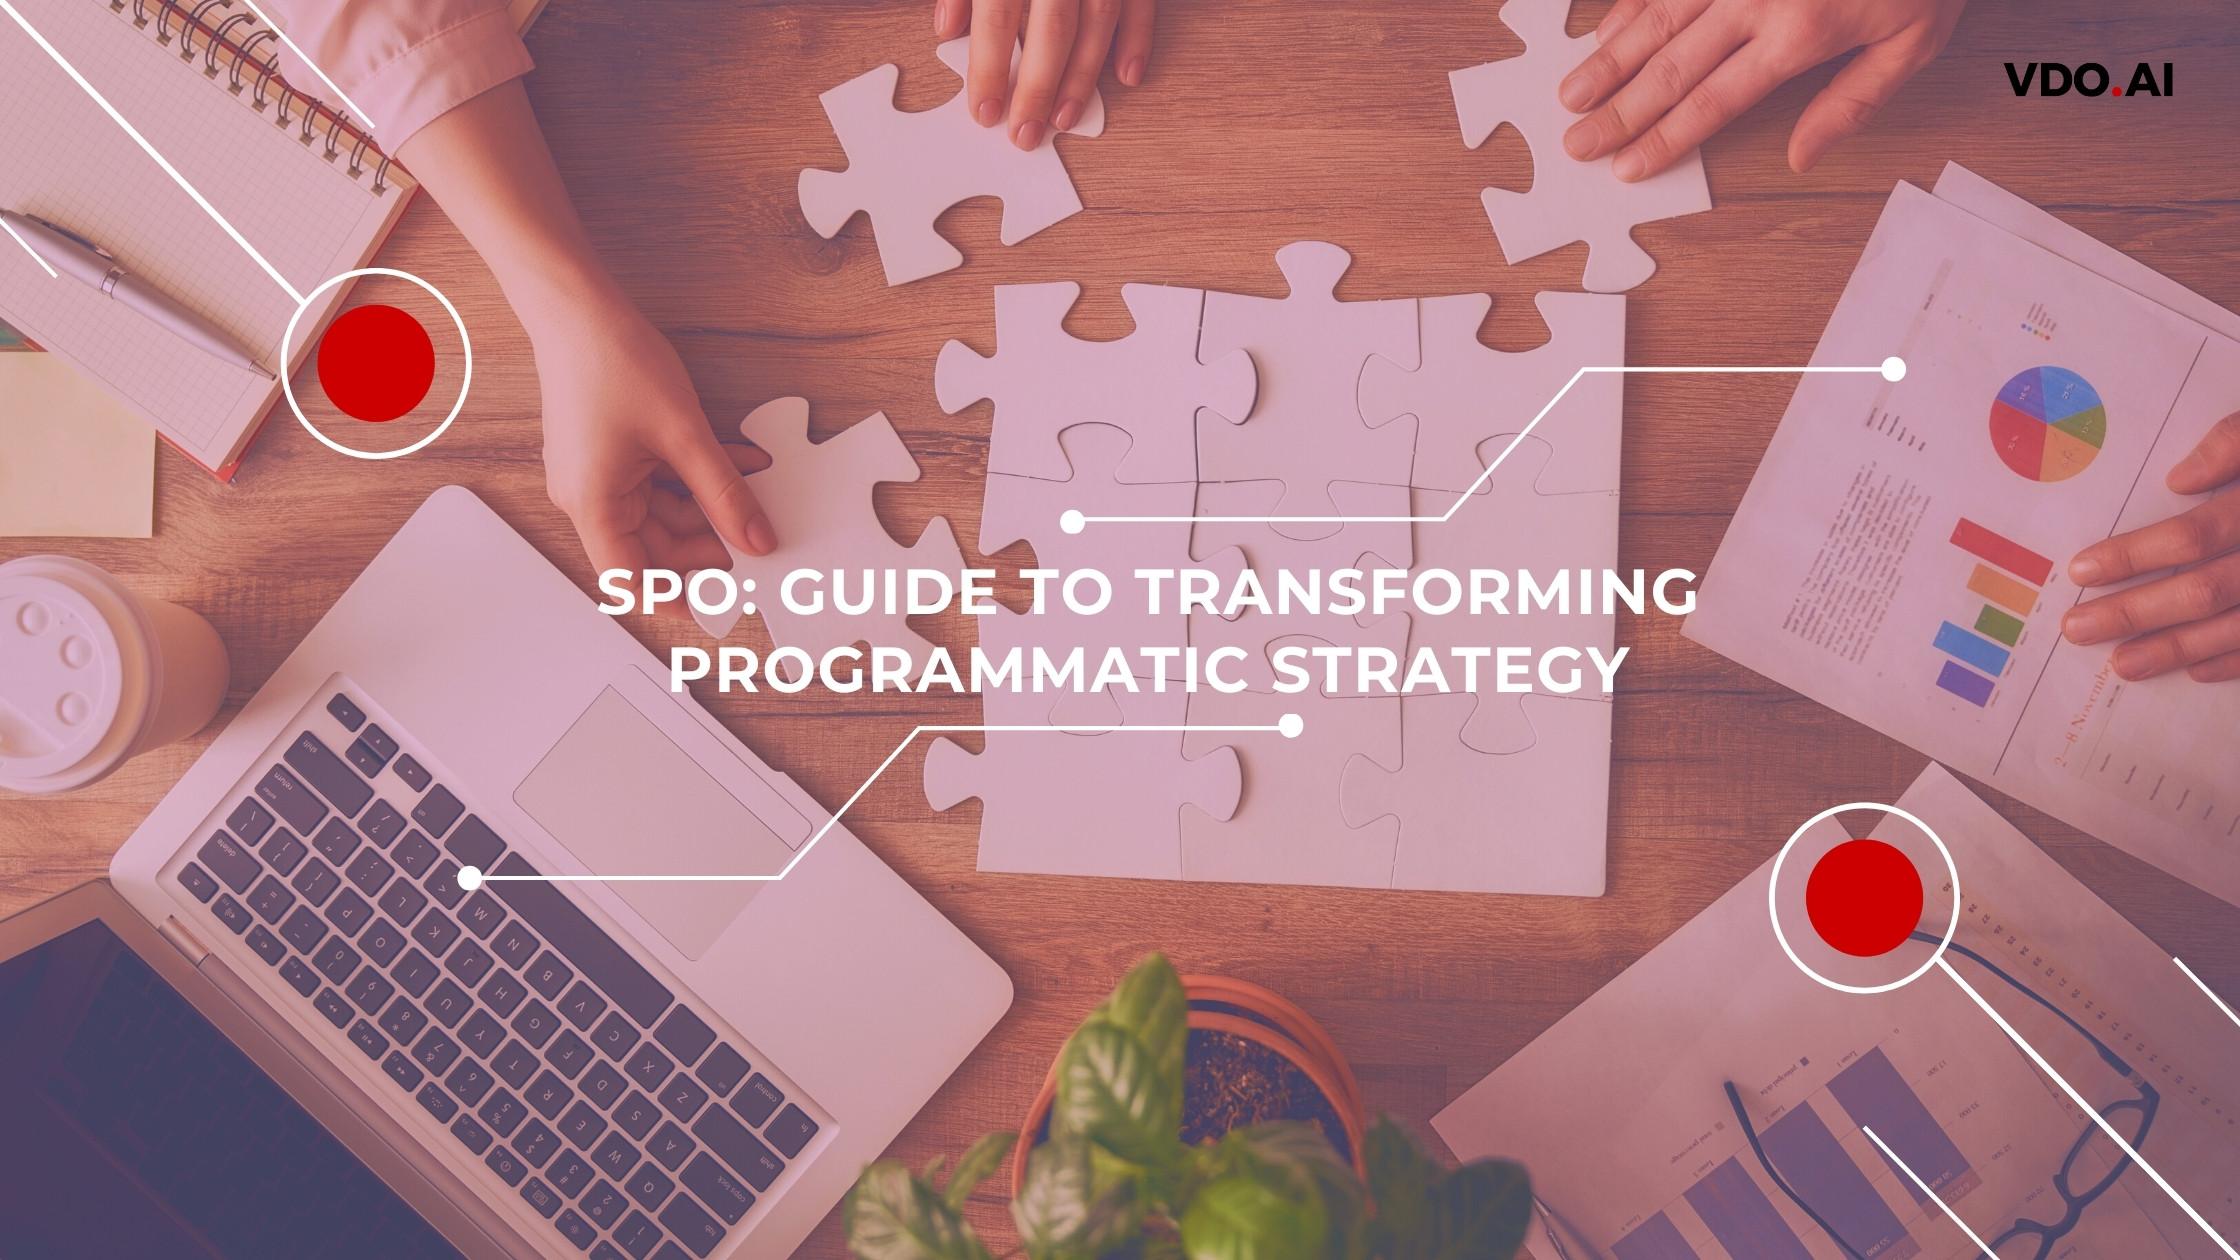 SPO_ Guide to Transforming Programmatic Strategy